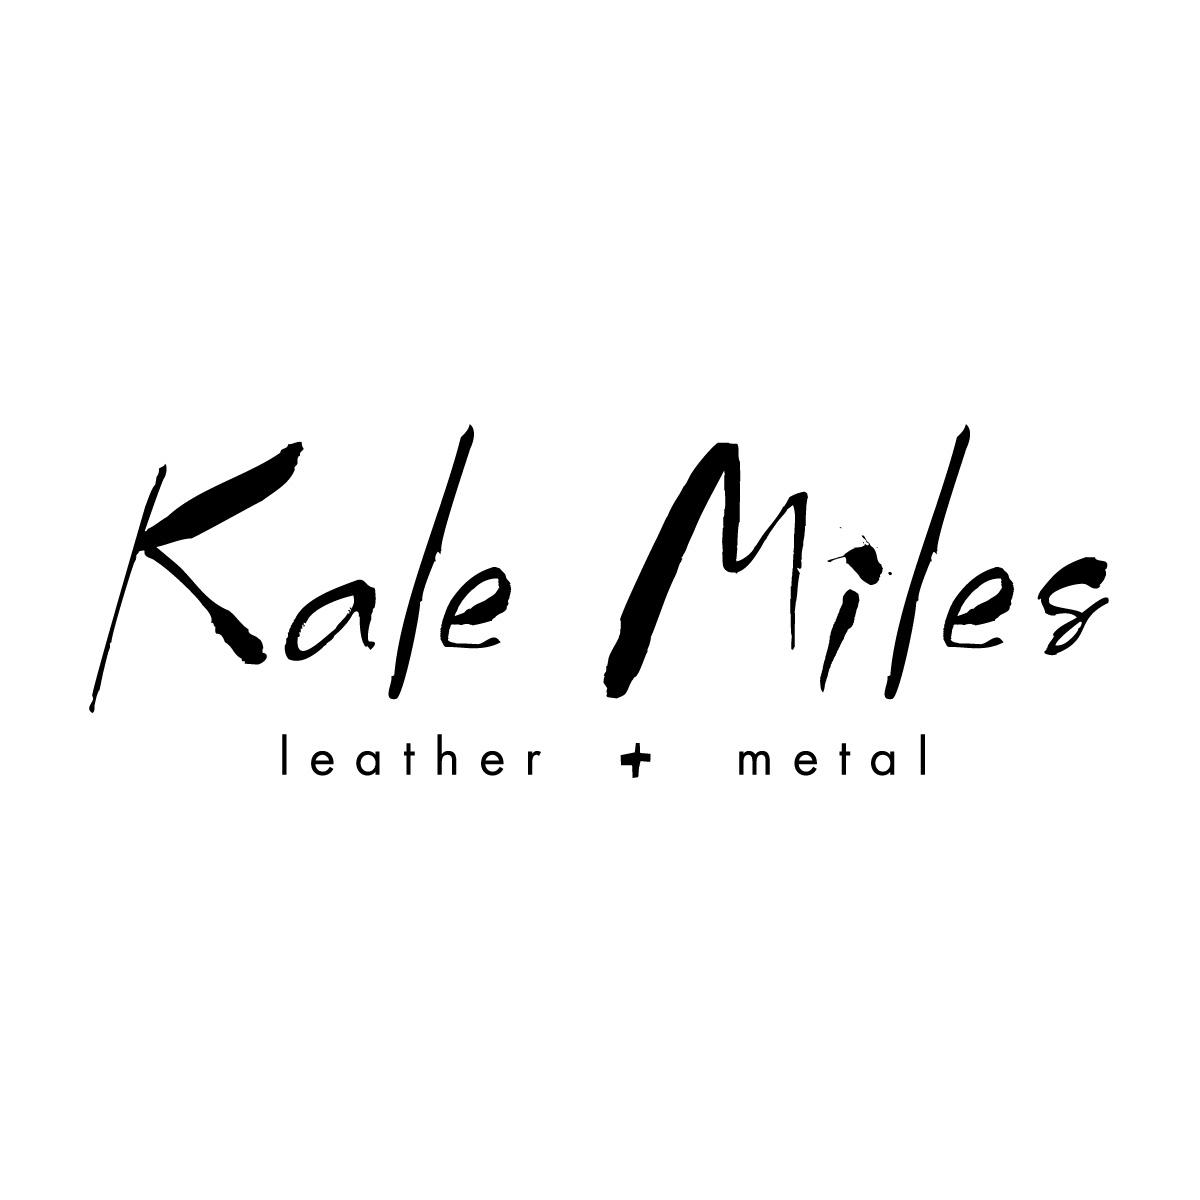 Kale Miles